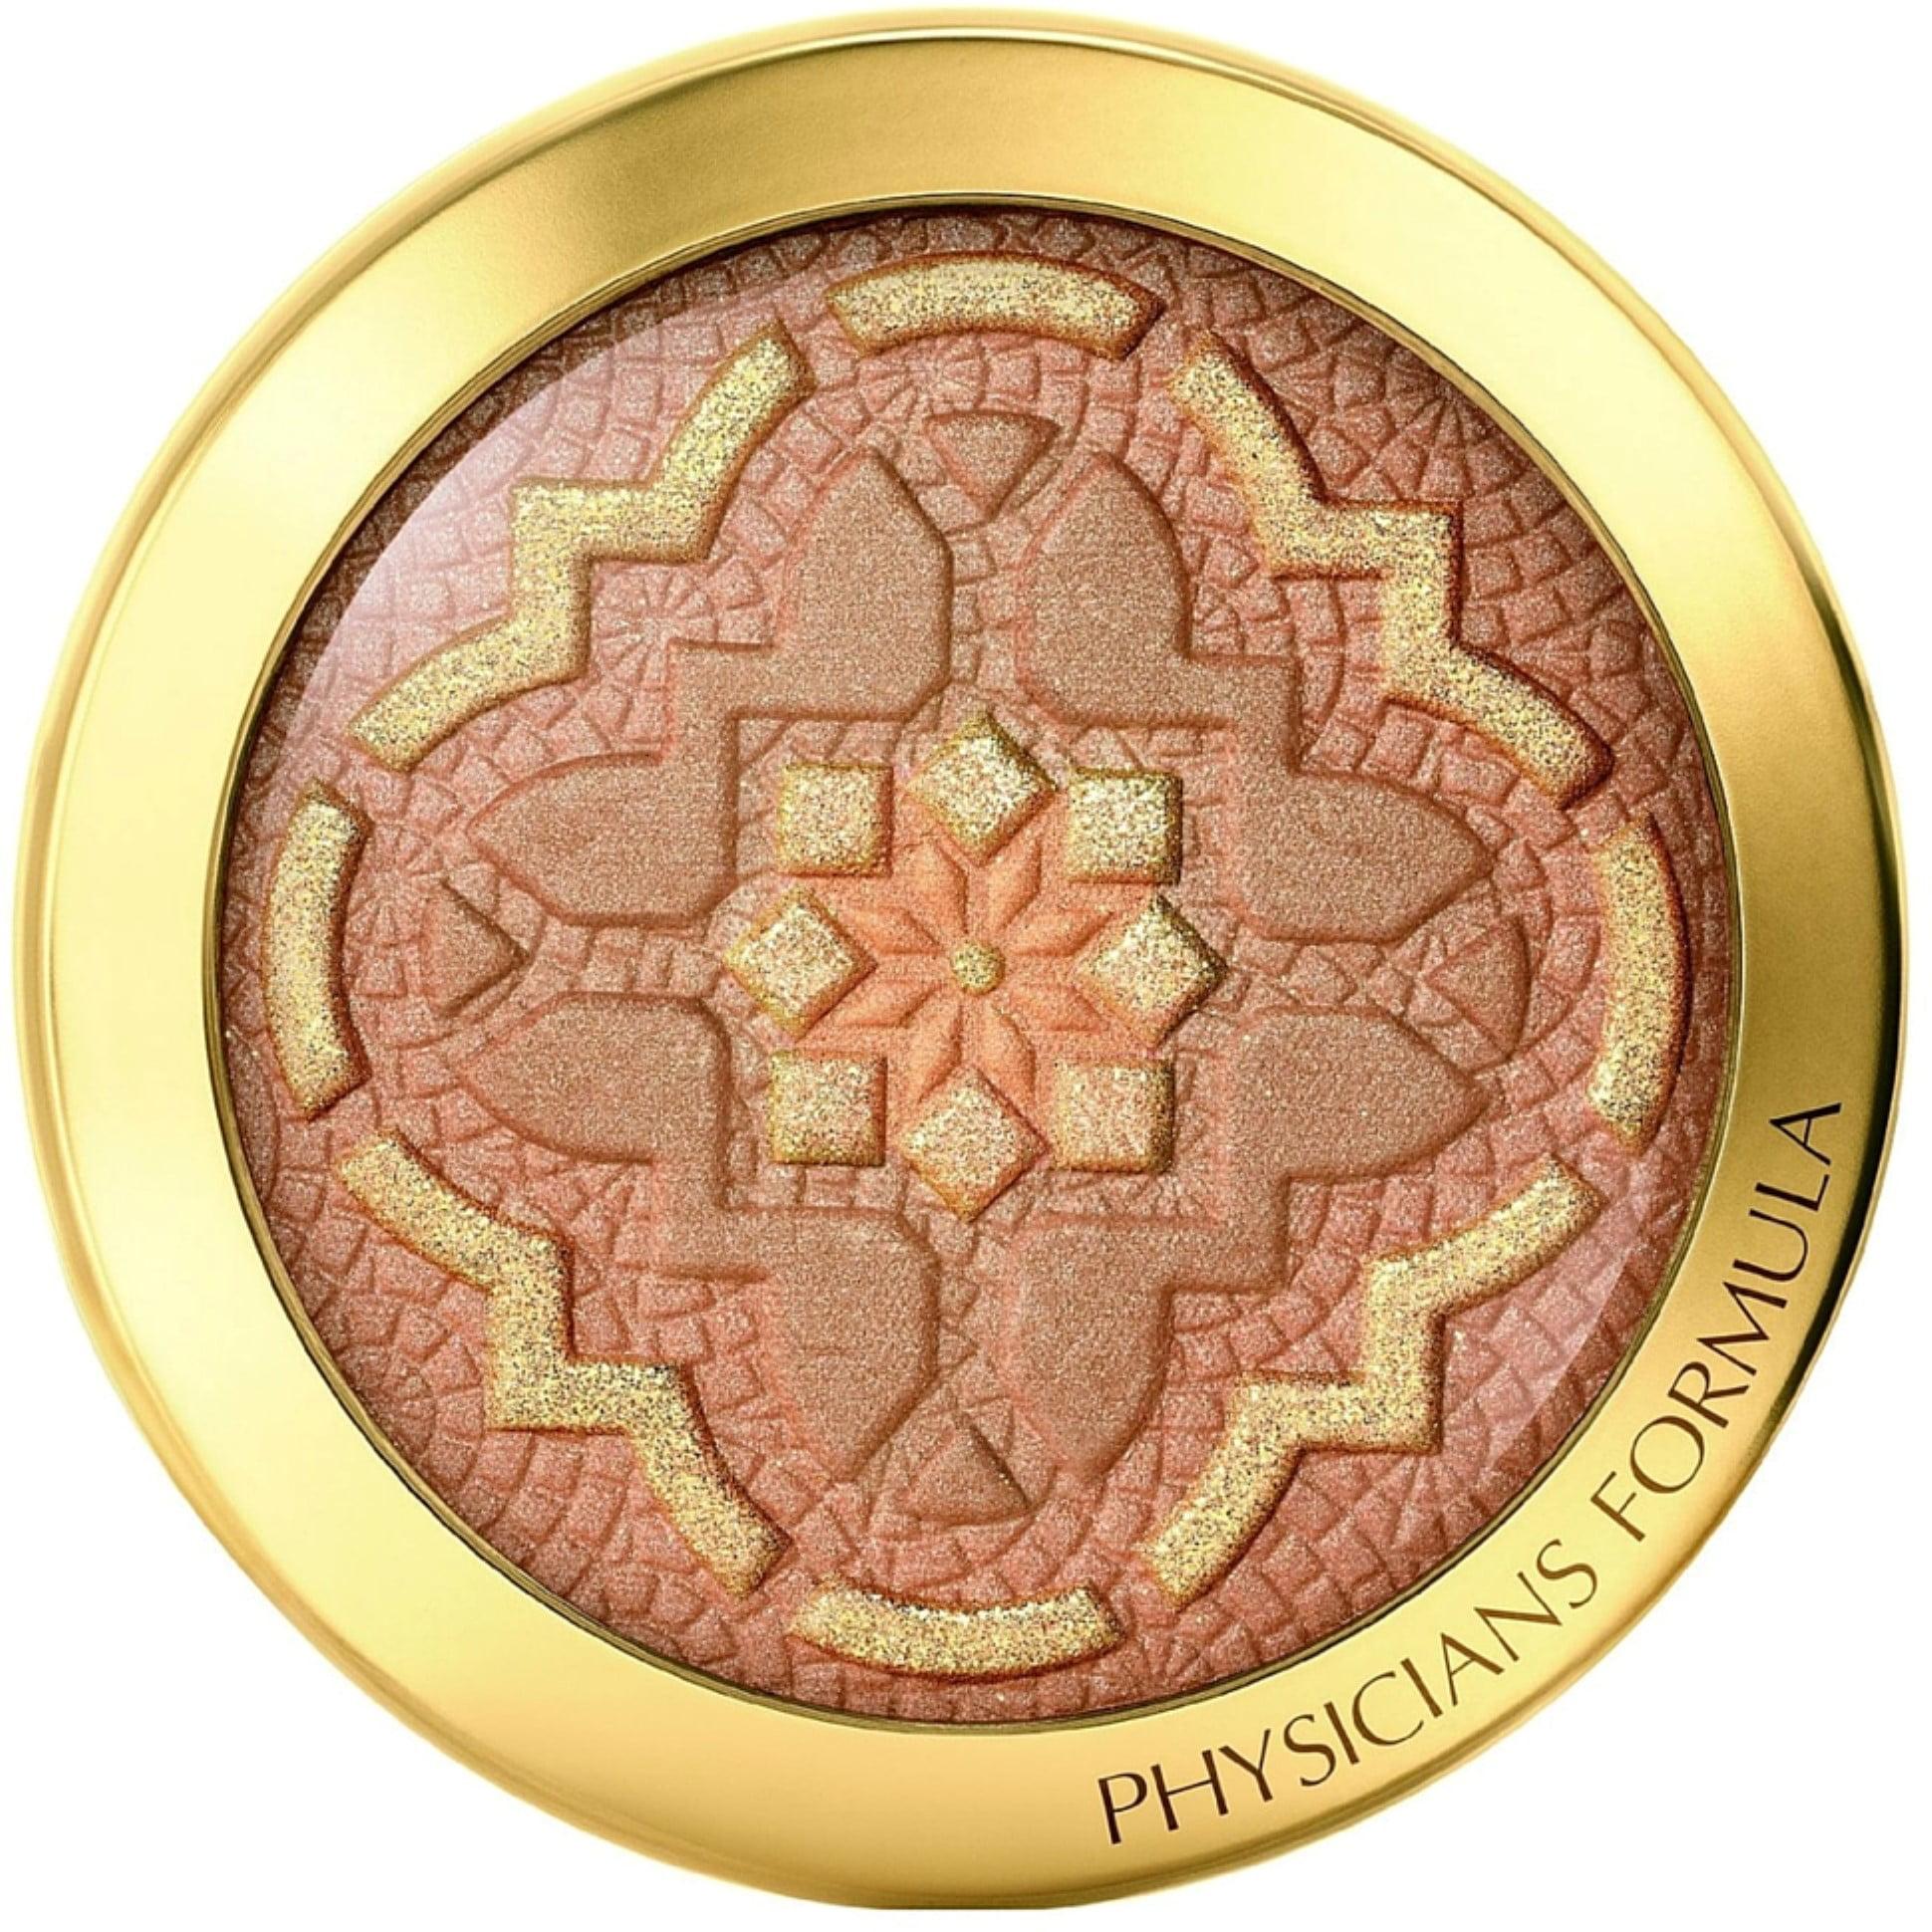 2 Pack - Physician's Formula Argan Wear Ultra-Nourishing Argan Oil Bronzer, Light Bronzer [6439] 0.38 oz